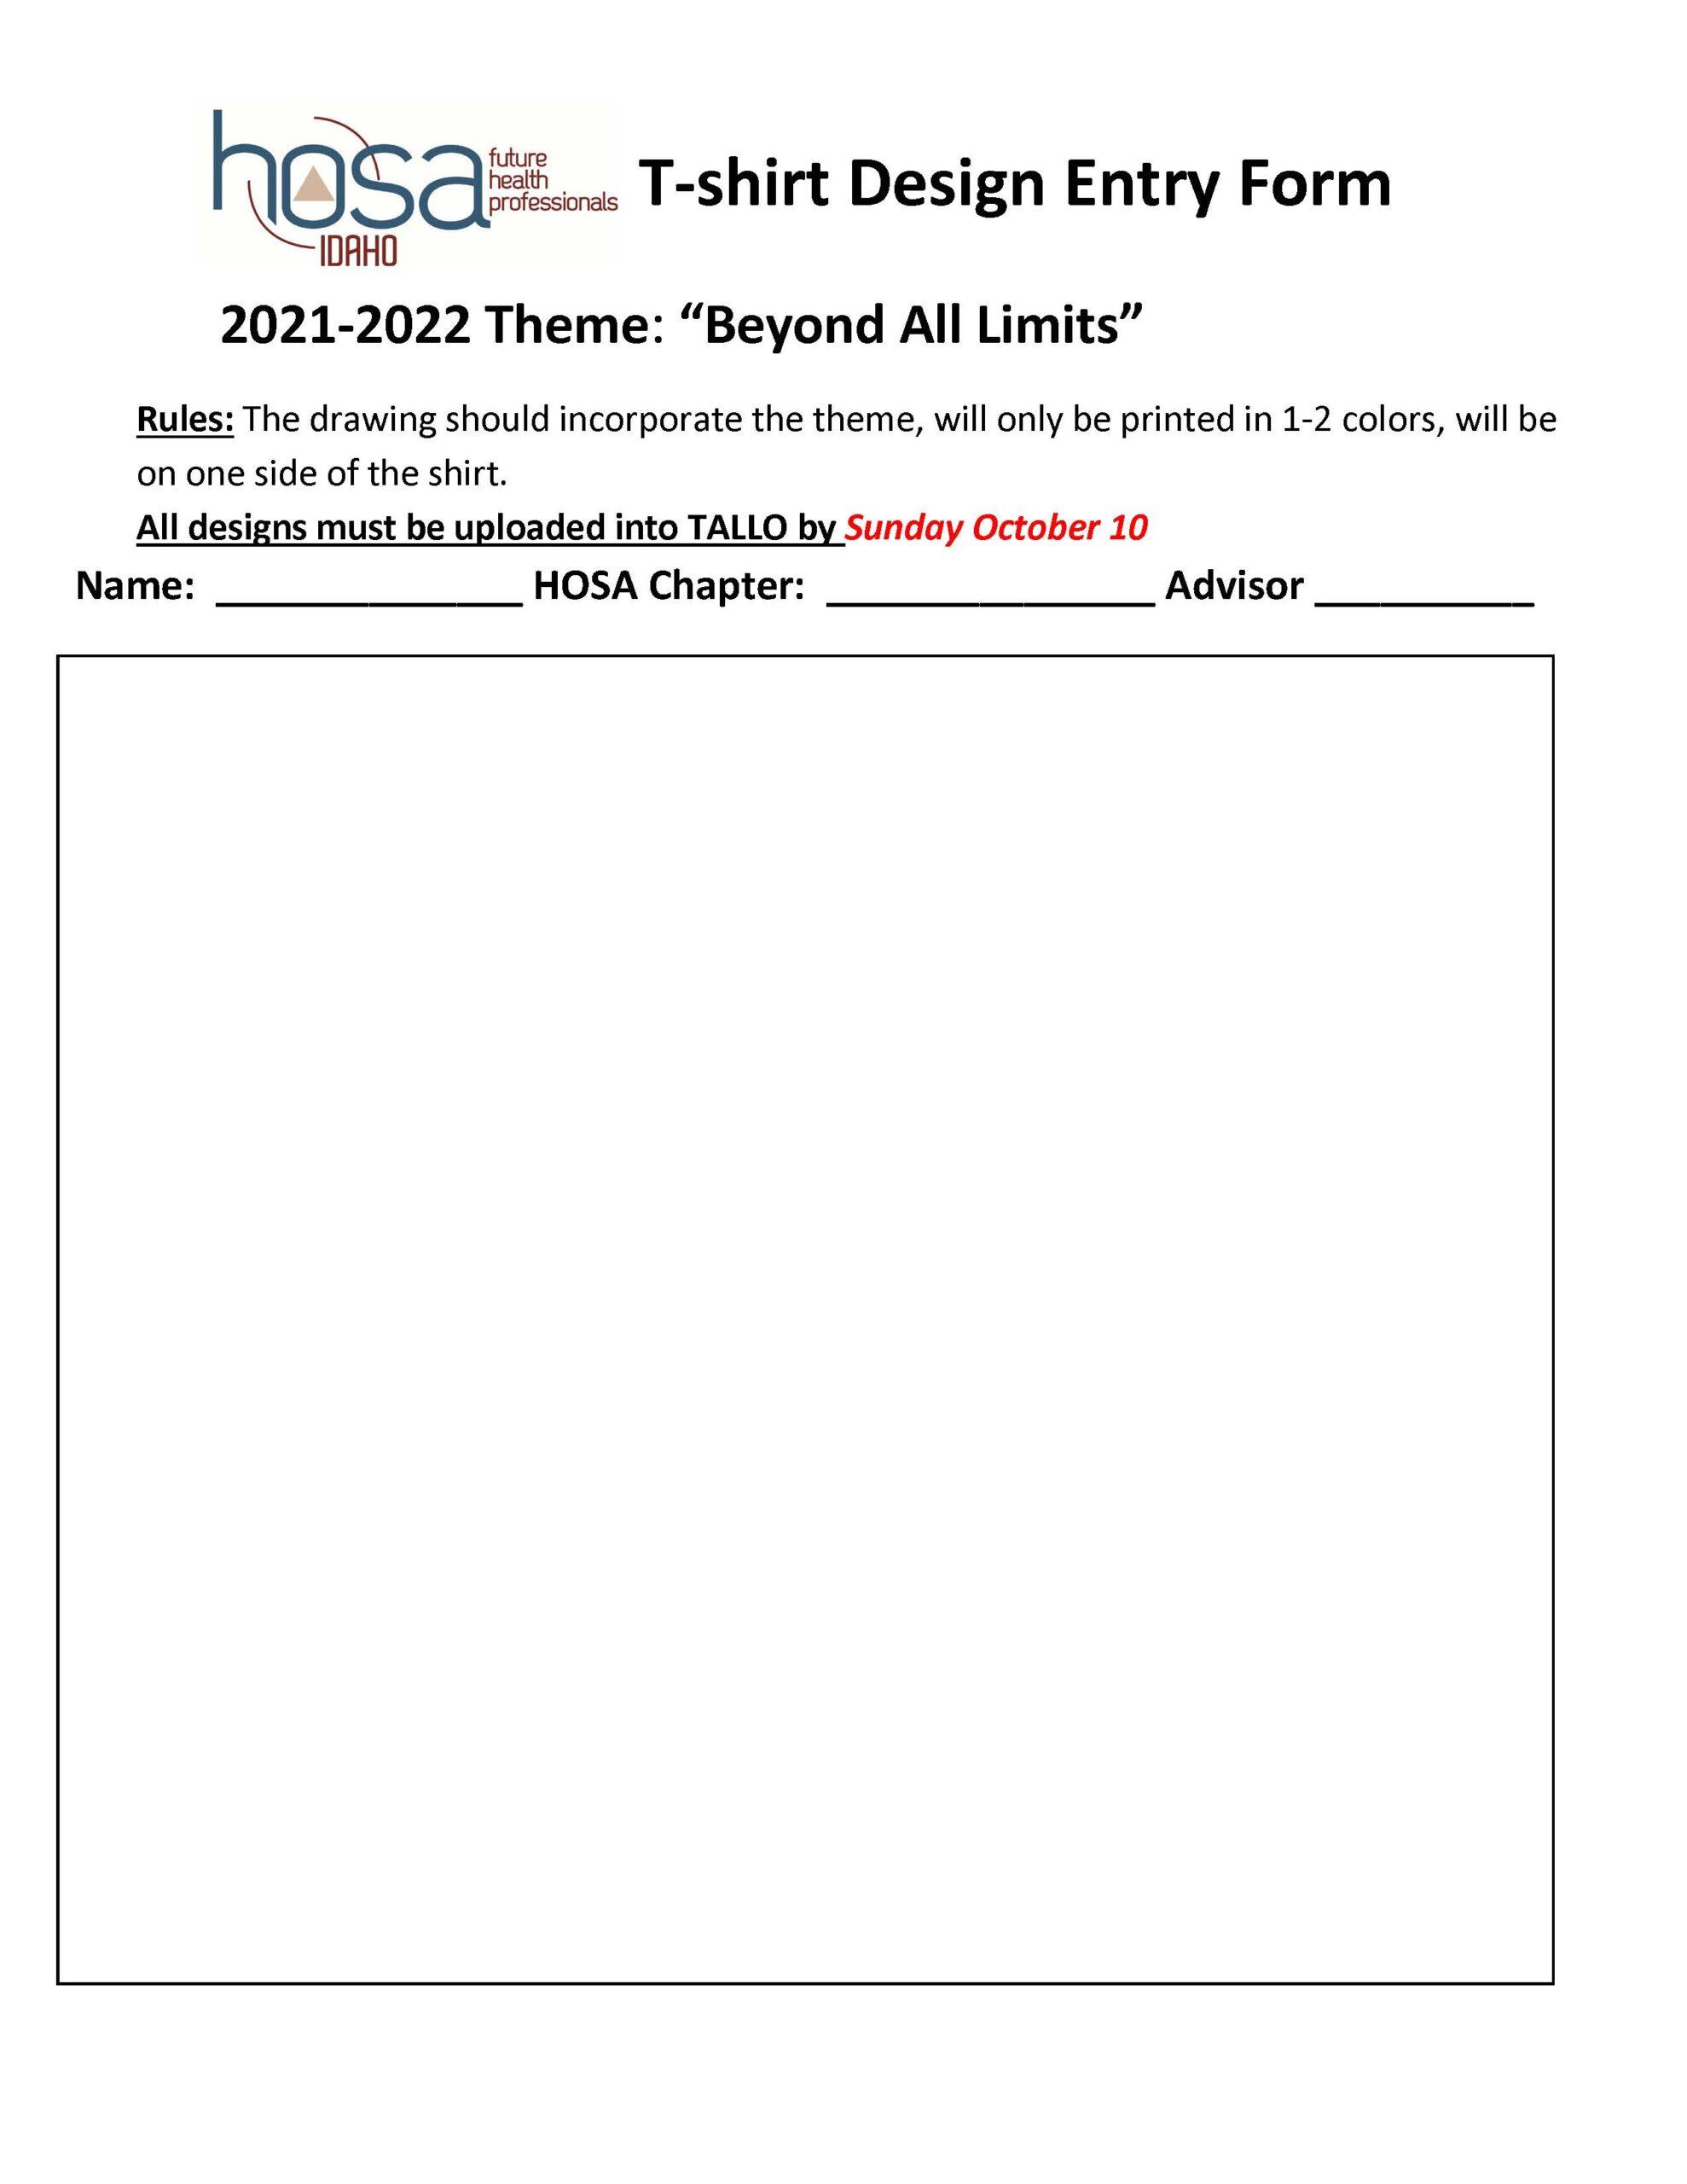 T-shirt design entry form - BLANK 2122